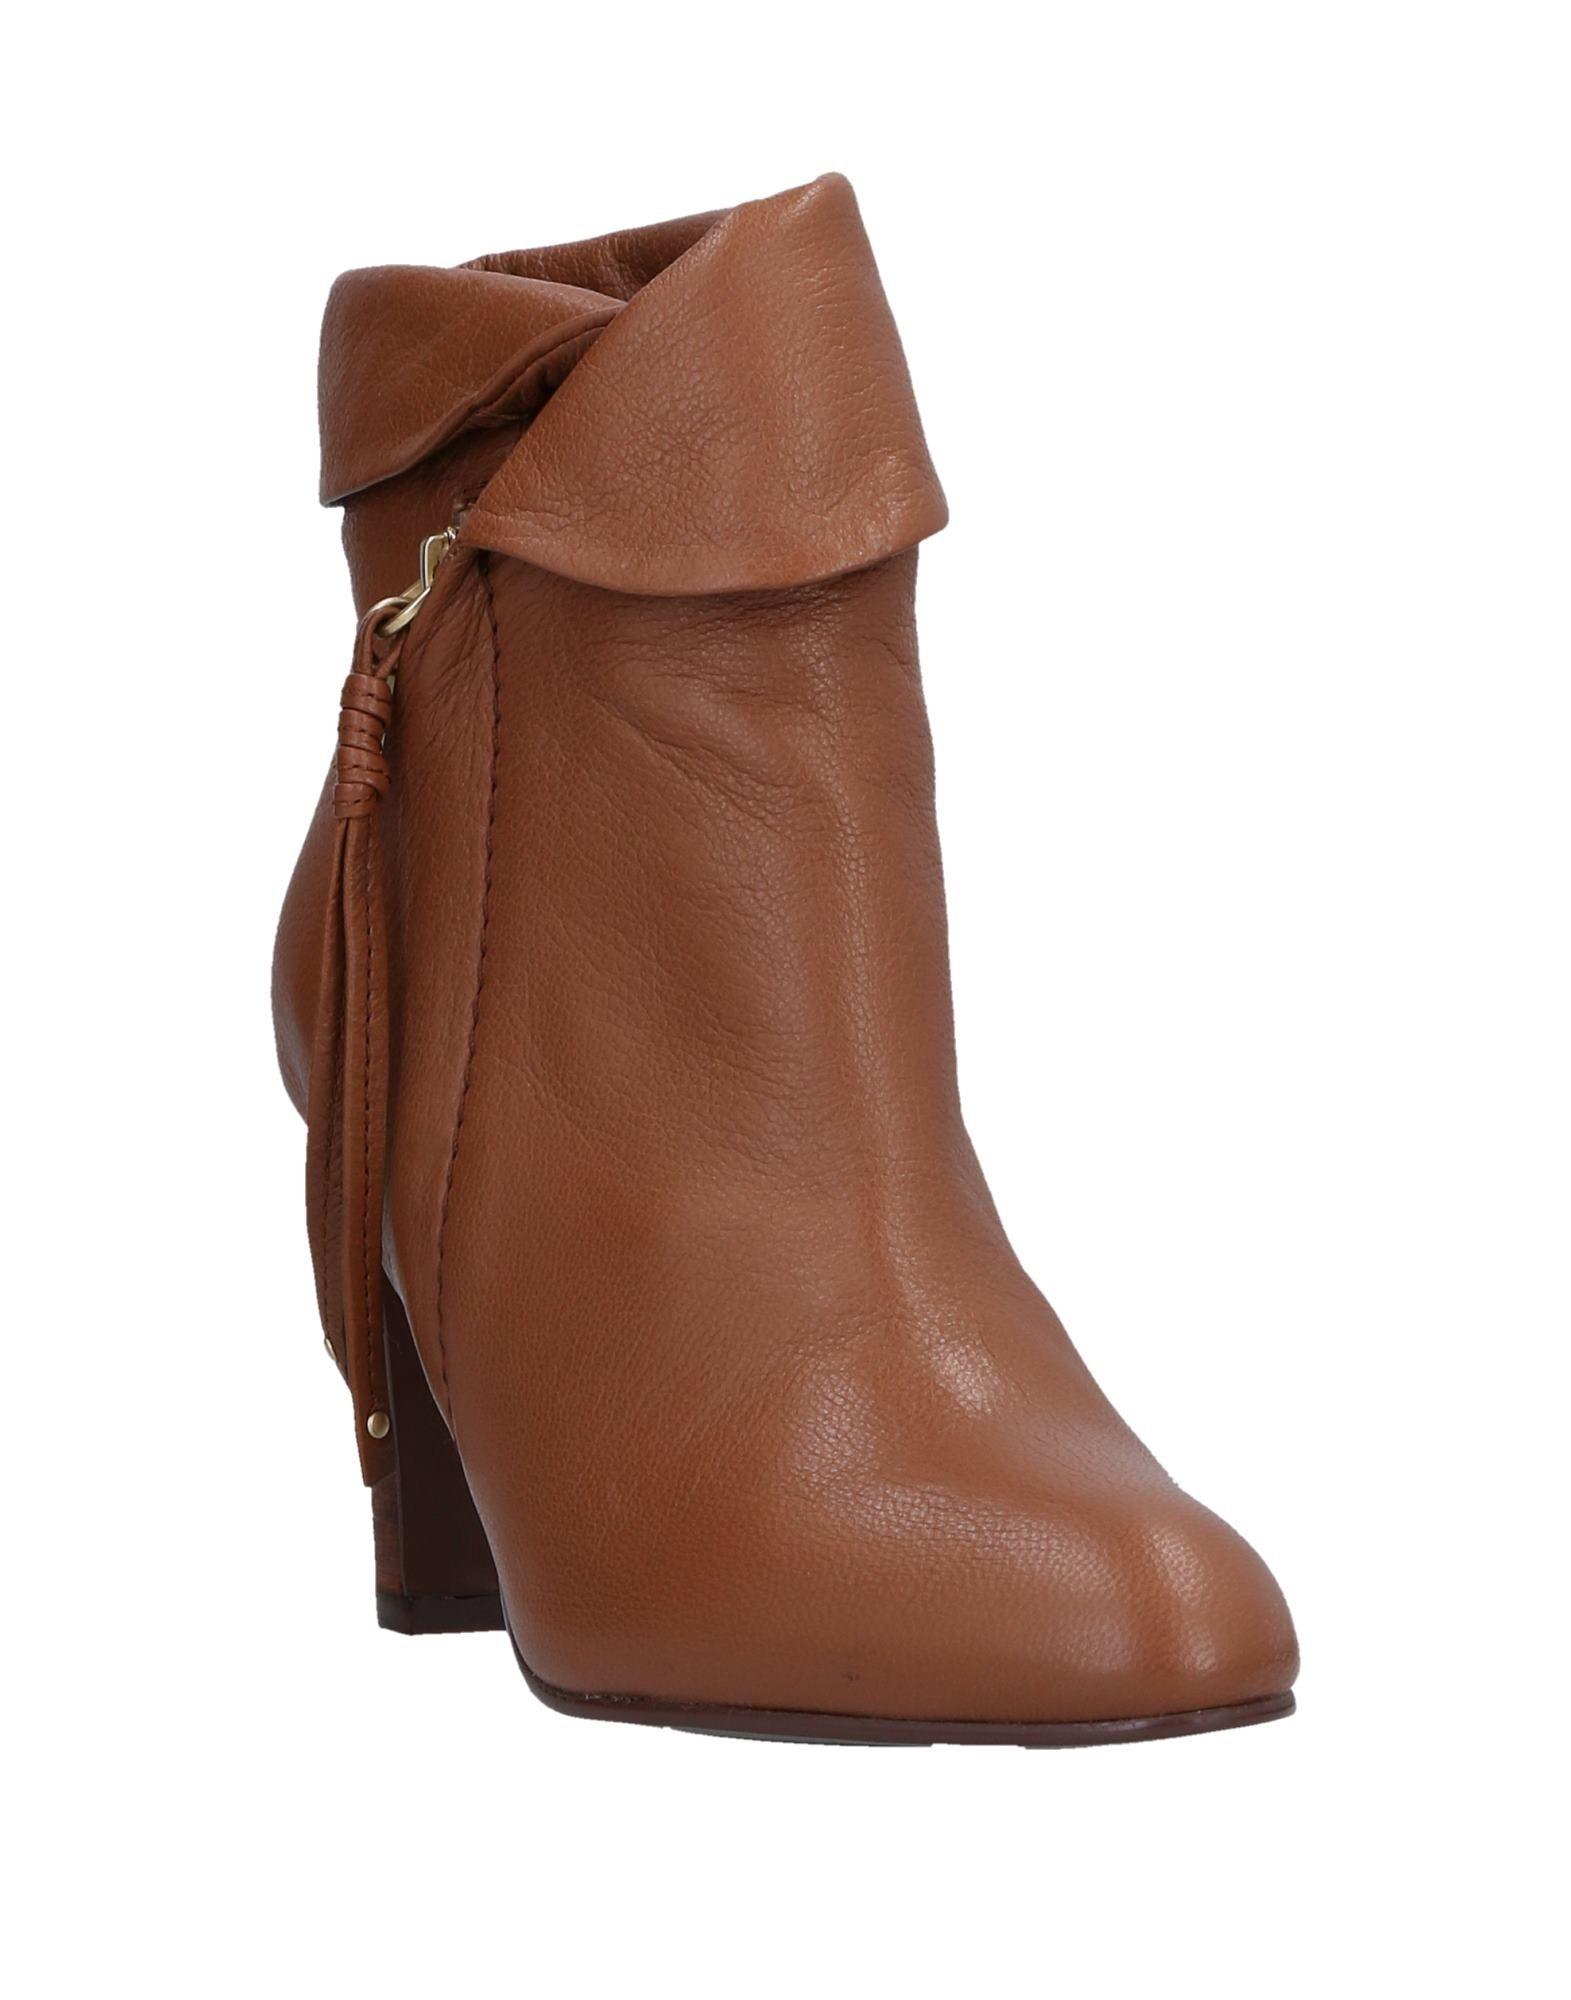 Rabatt Stiefelette Schuhe See By Chloé Stiefelette Rabatt Damen  11531172PM 56bcf6